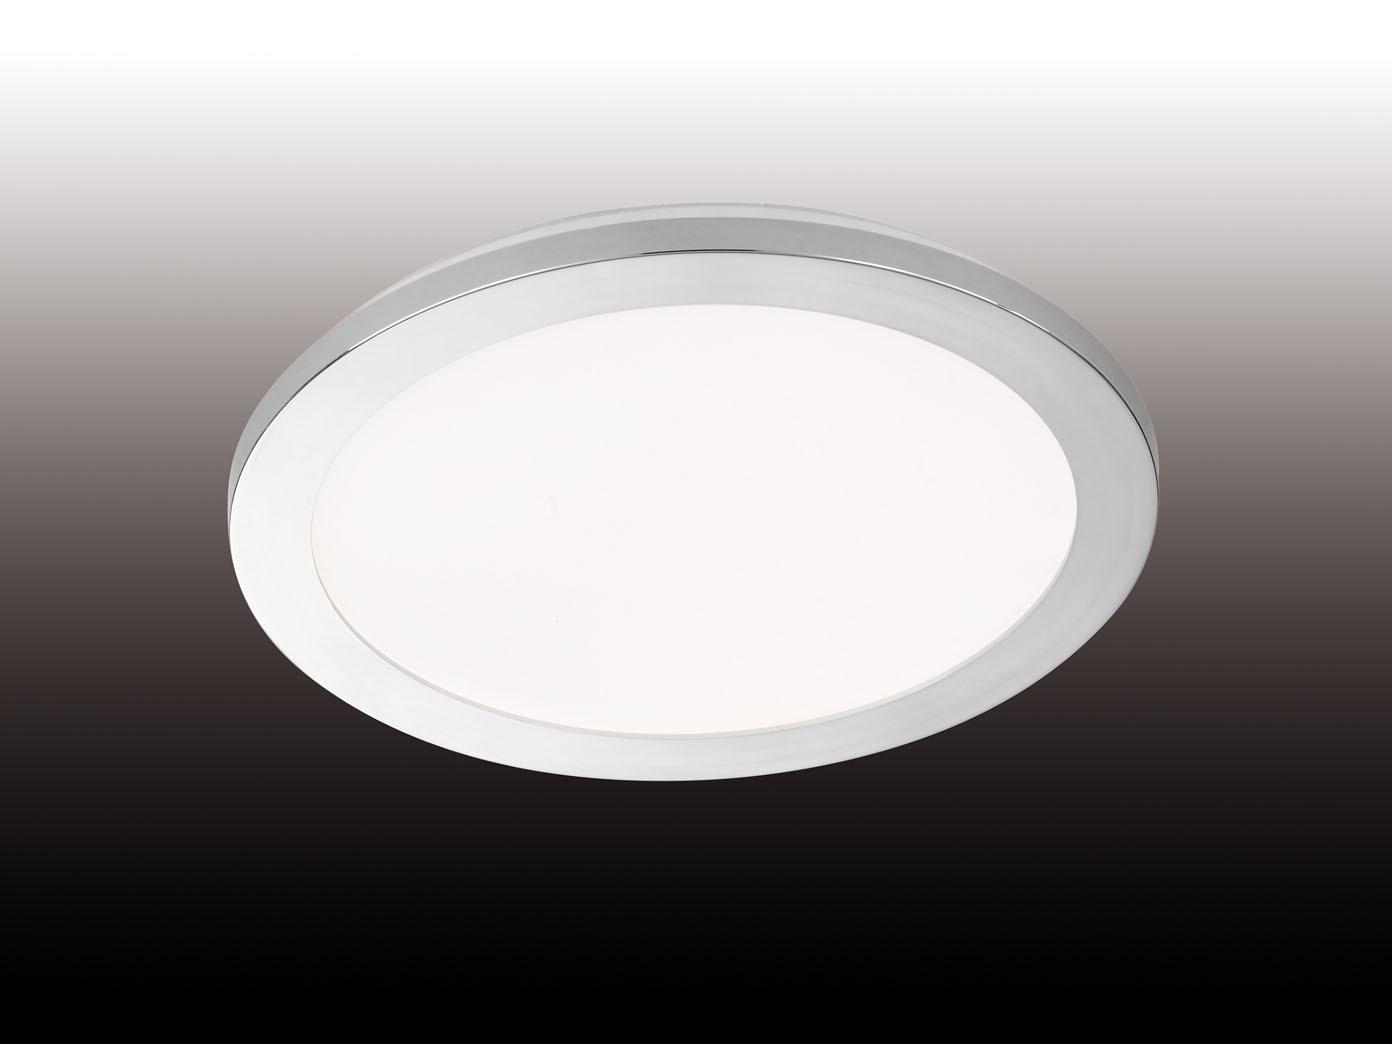 dimmbare led deckenleuchte badezimmerlampe 30cm chrom. Black Bedroom Furniture Sets. Home Design Ideas